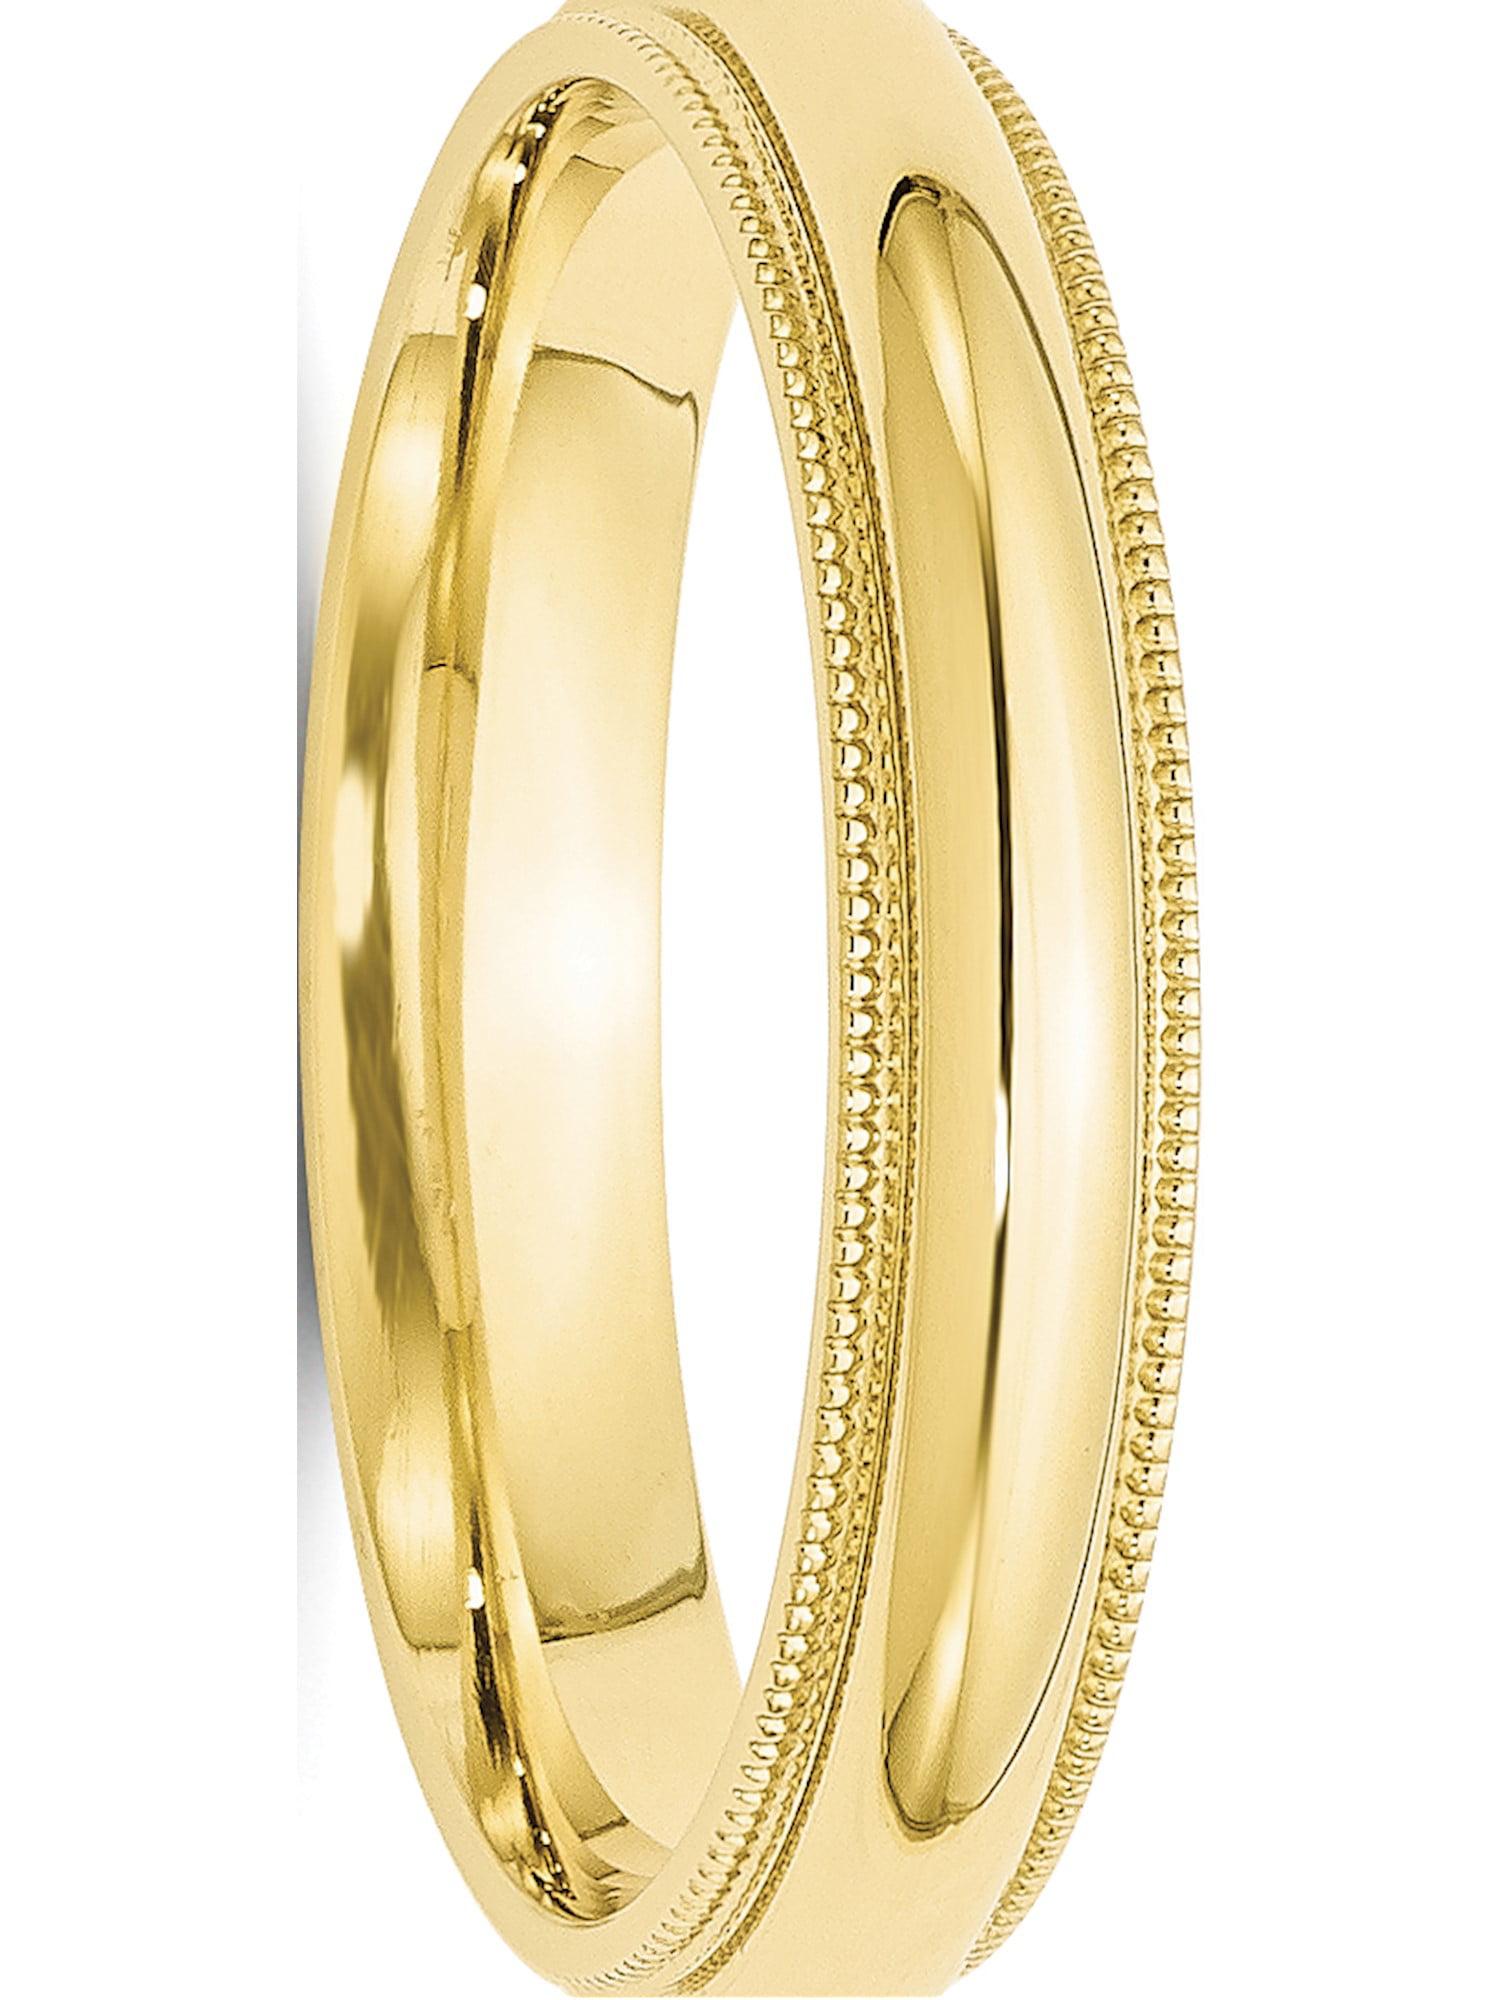 10k Yellow Gold 4mm Milgrain Comfort Fit Wedding Ring Band Size 4-14 Full /& Half Sizes